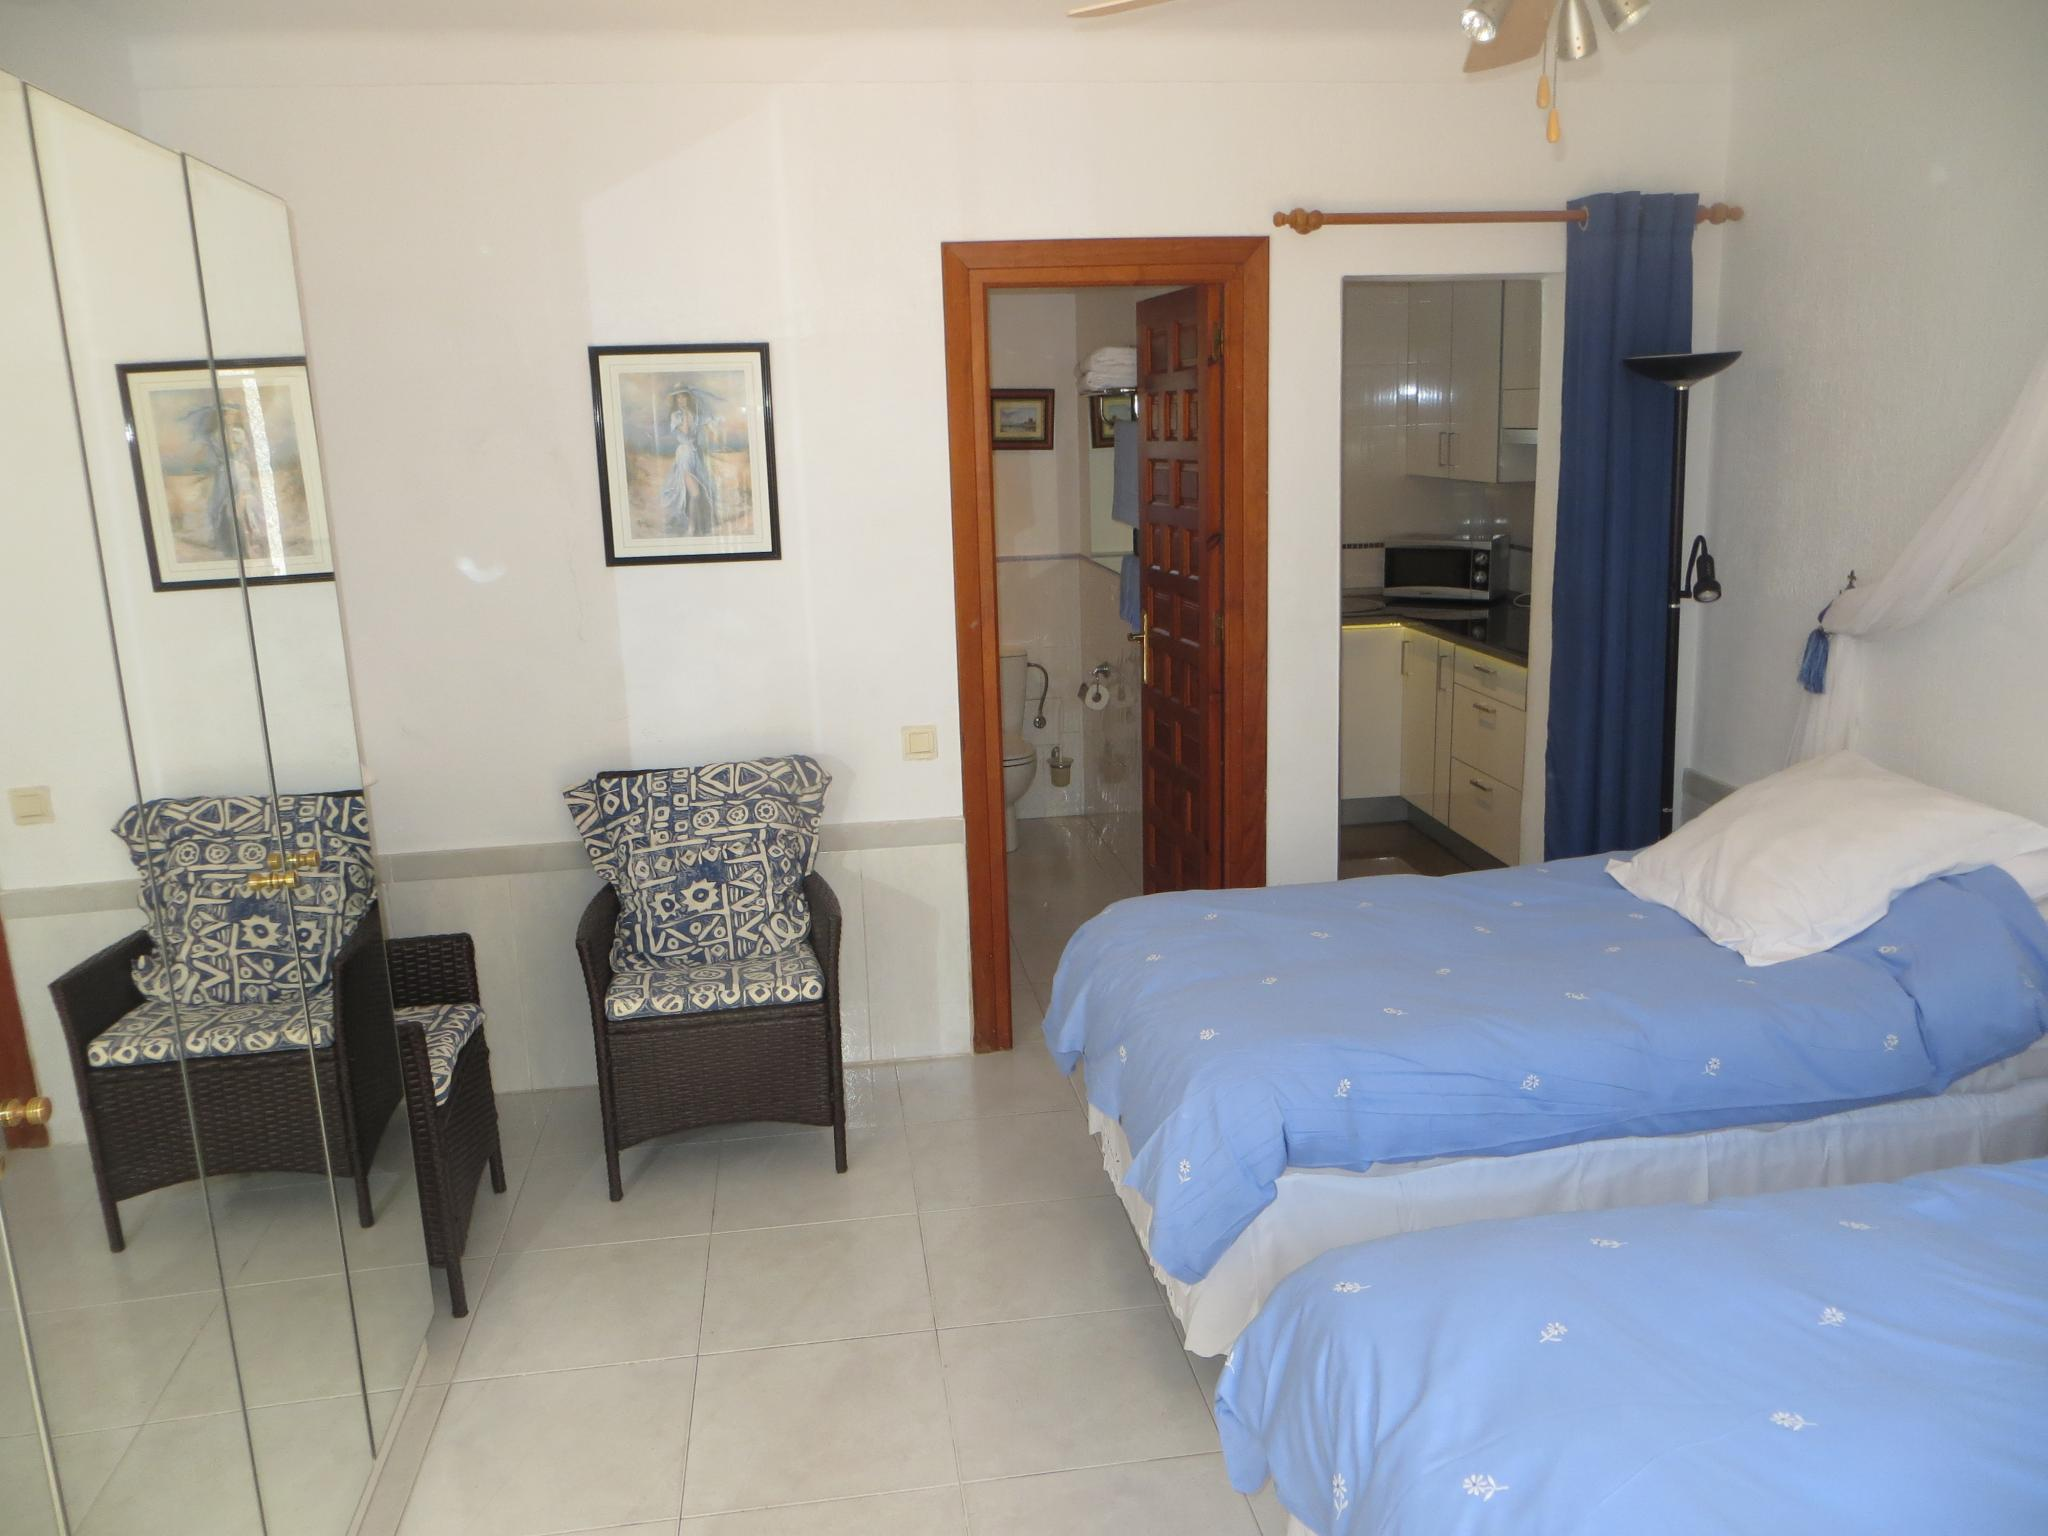 5 Bedroom Detached Villa House For Sale - Photograph 5